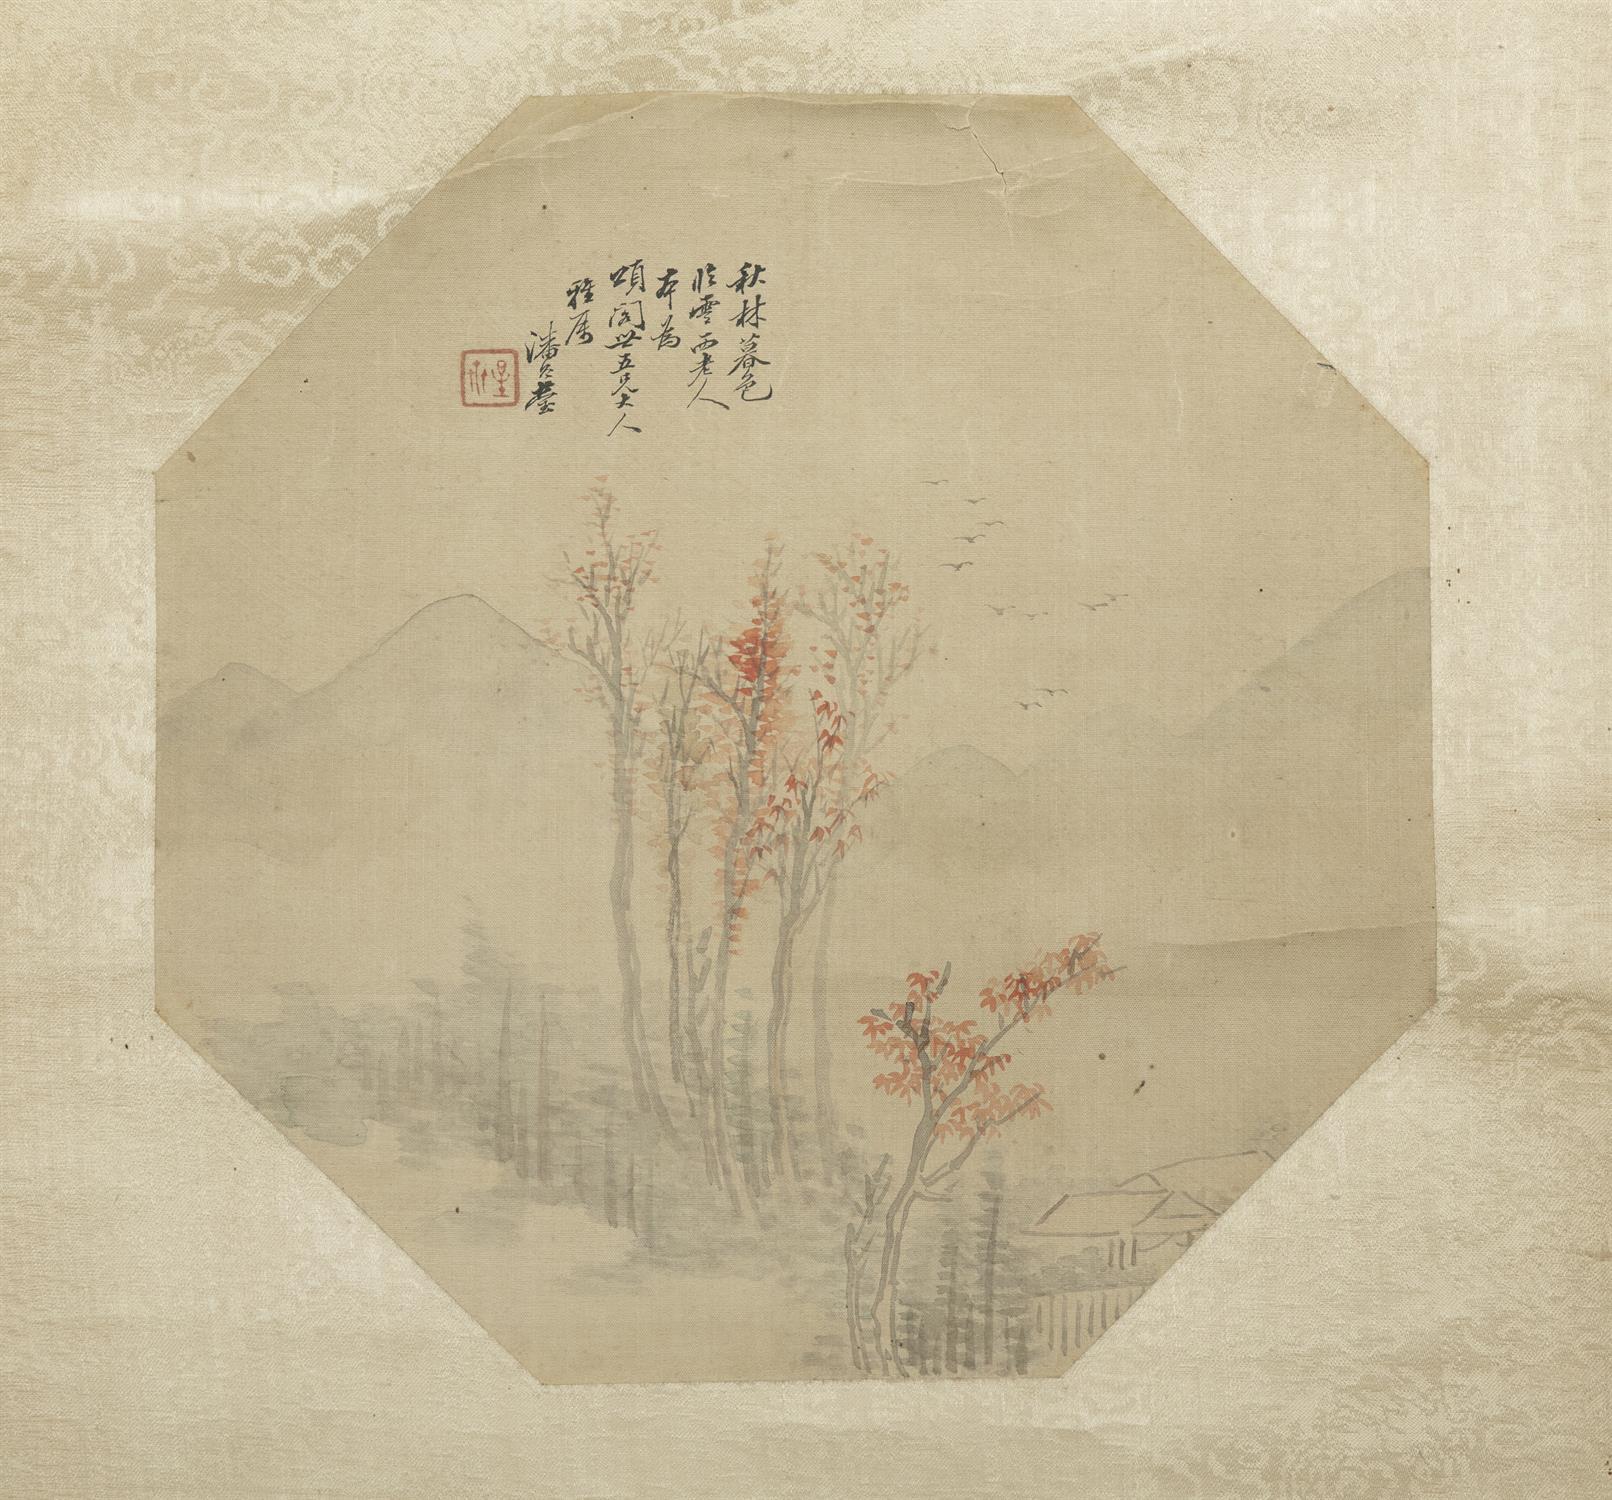 CHINESE SCHOOL, PAN ZENGYING 潘冬莹 (1808-1878), WENG TONGHE 翁同龢 (1830-1904) AND ZHANG ZHIWAN 张之万 ( - Image 5 of 8